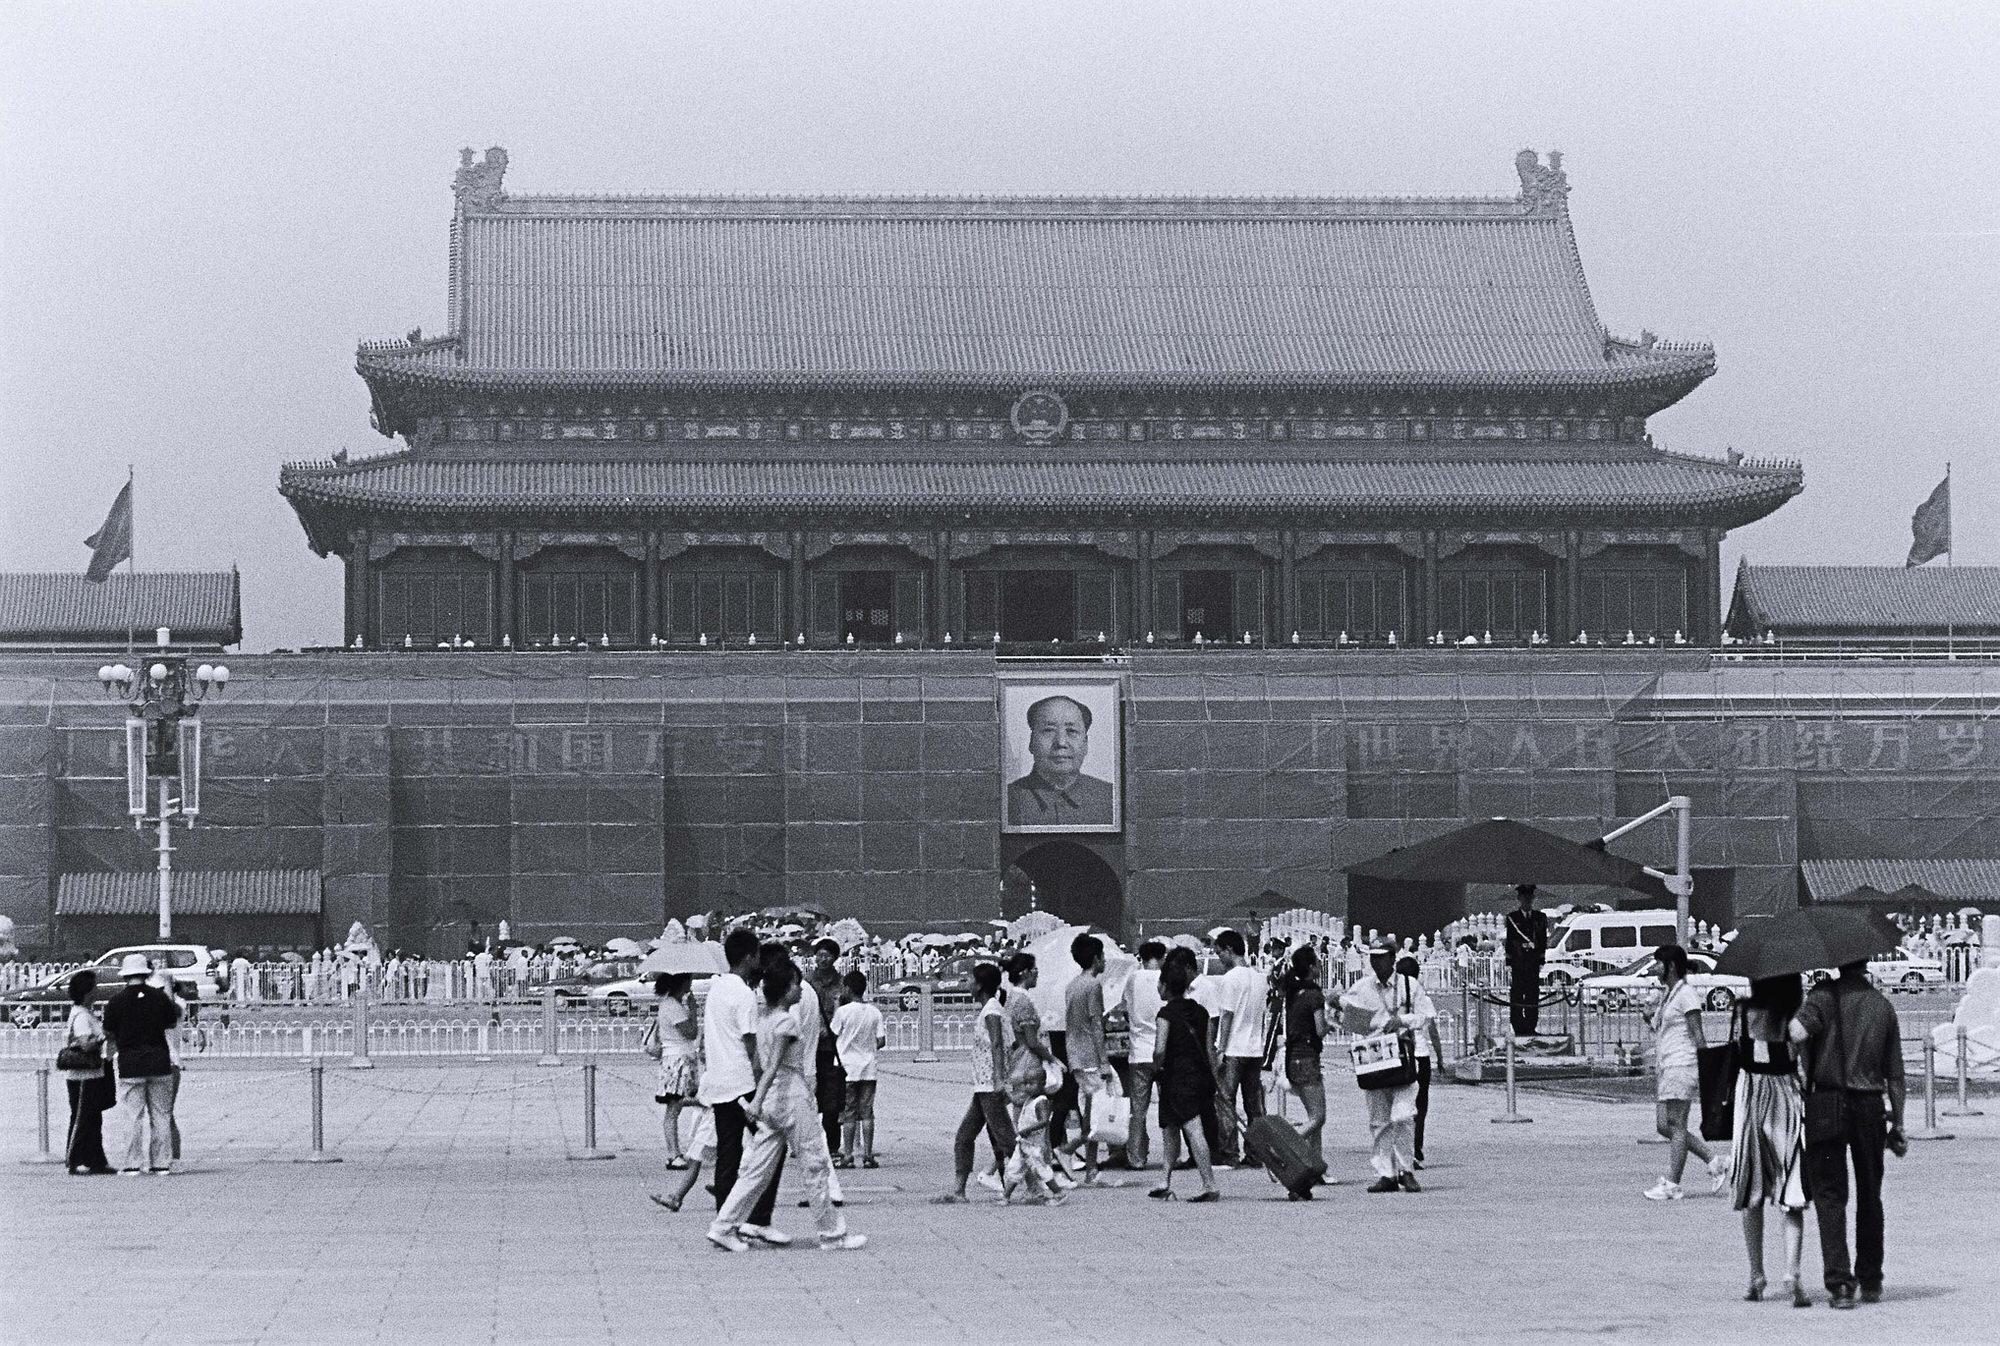 35mmPatrikWallner_Beijing_TianmenSquareLOWQ2